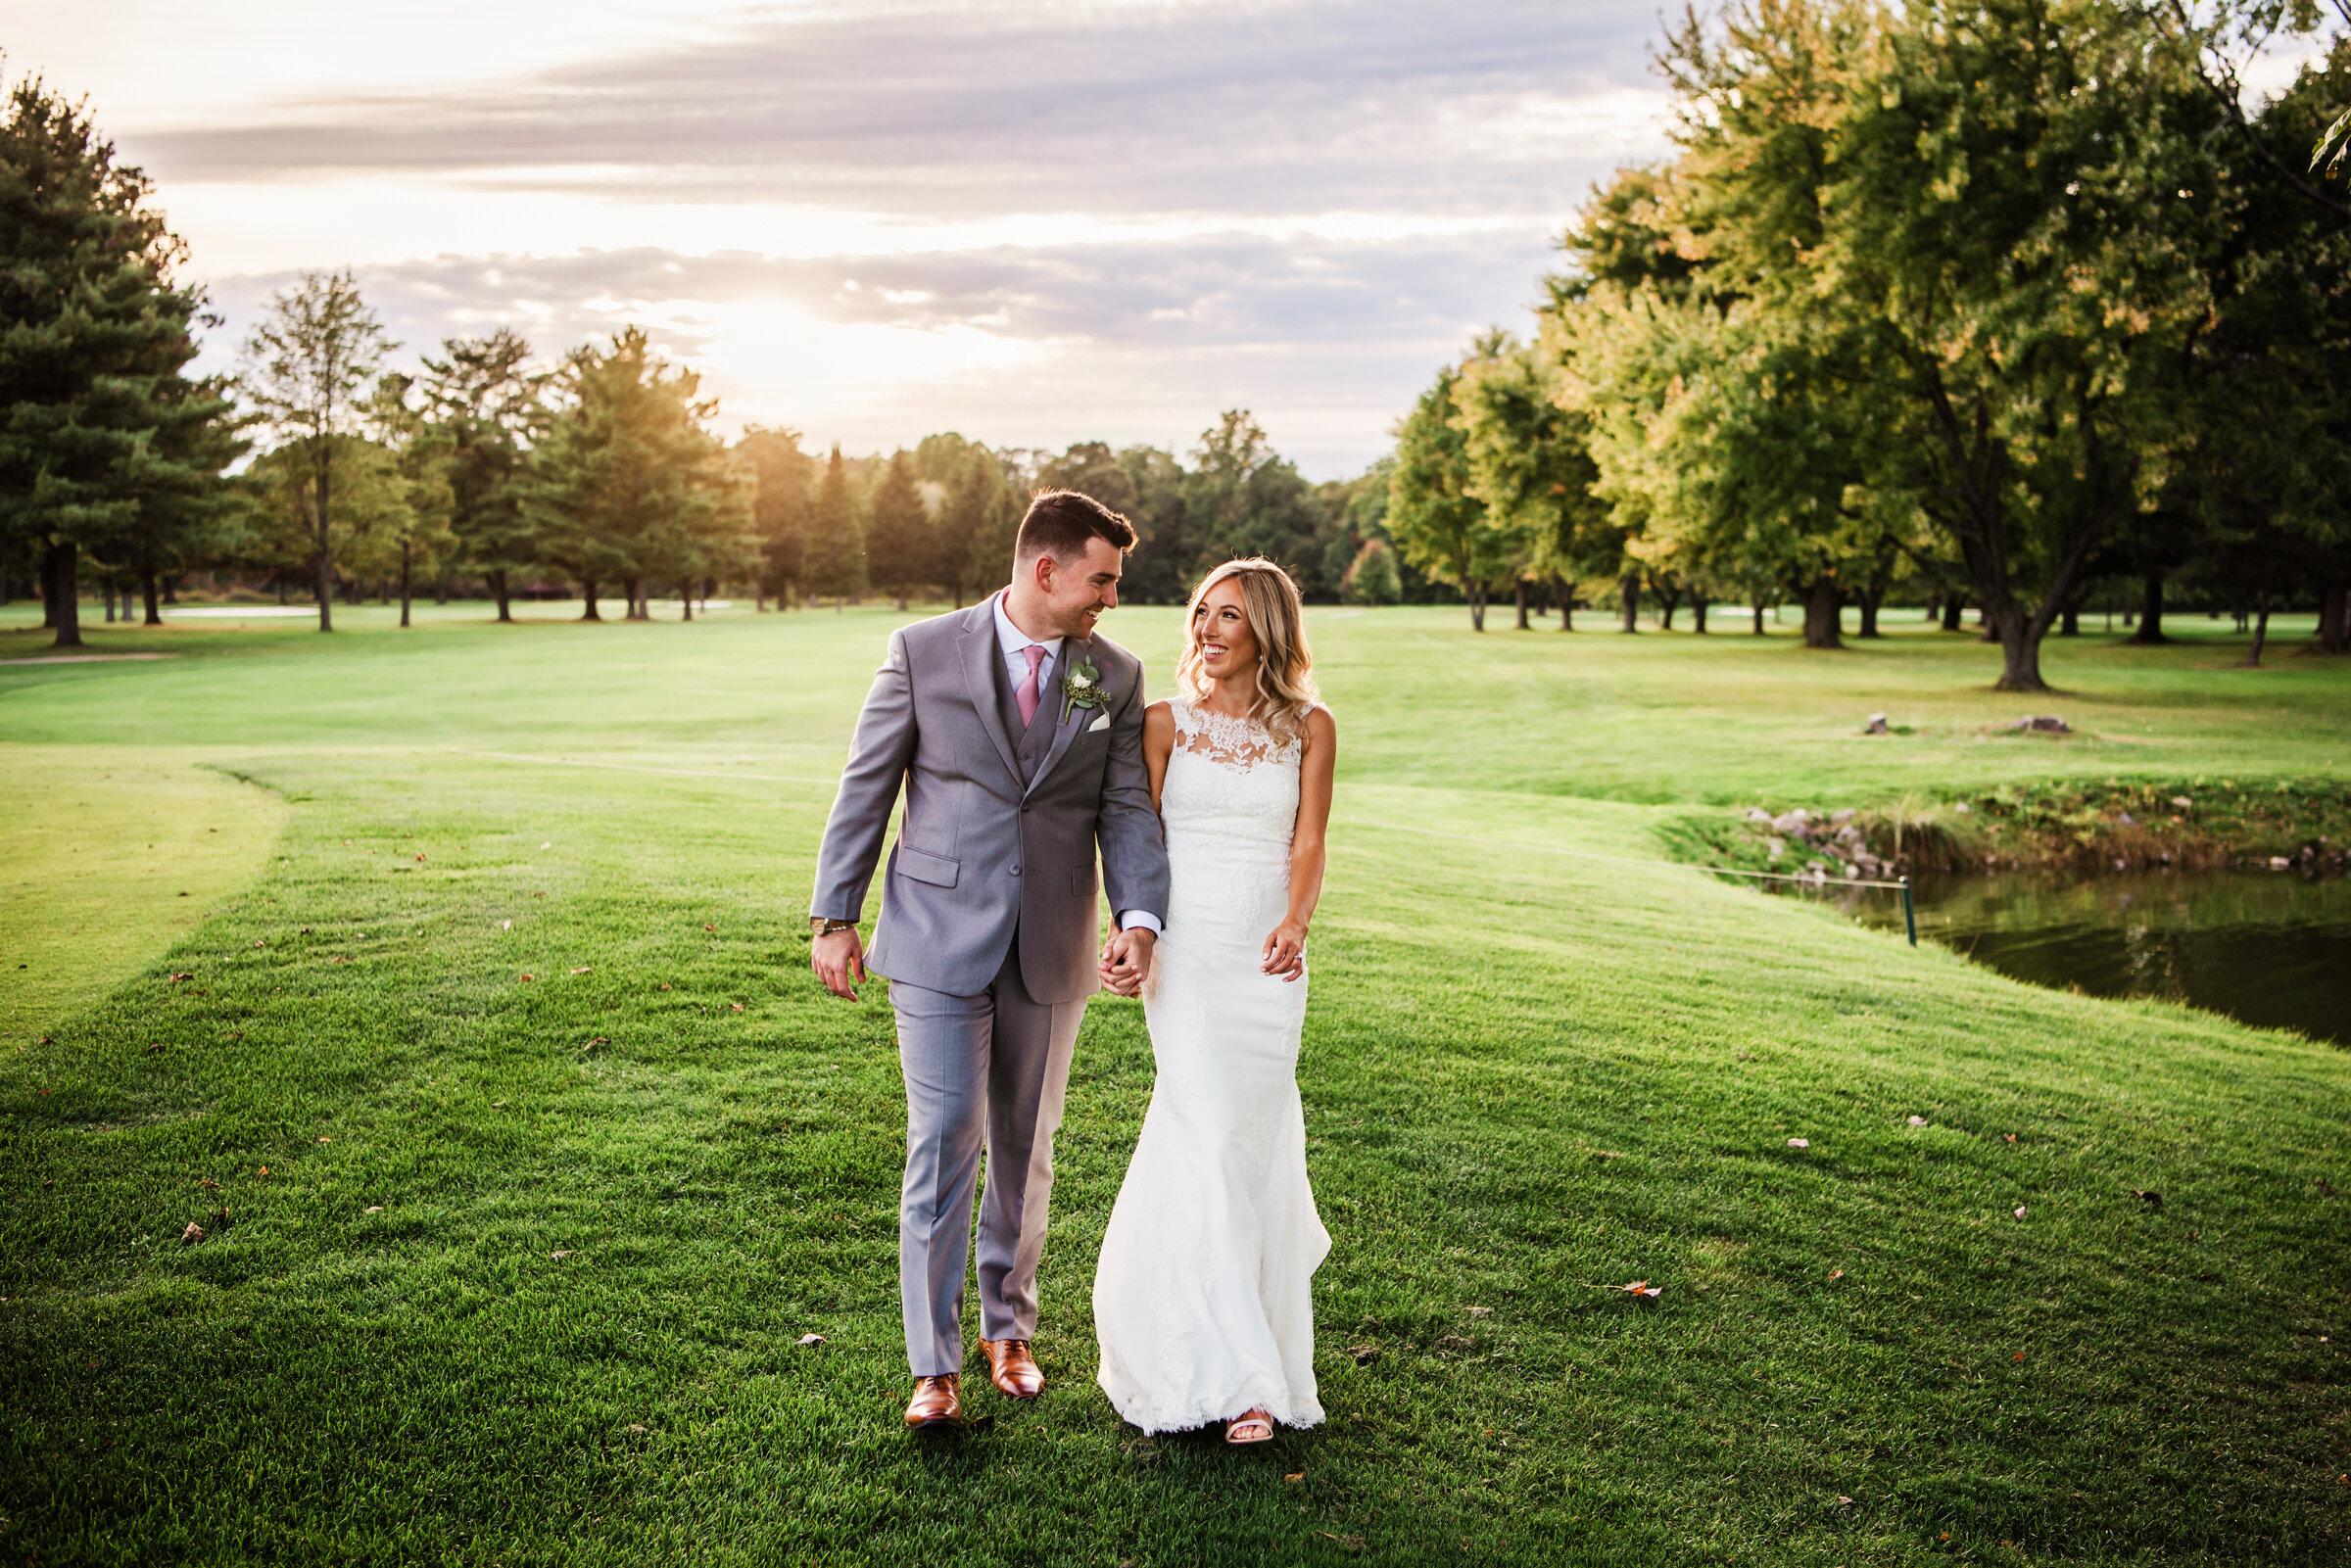 Deerfield_Country_Club_Rochester_Wedding_JILL_STUDIO_Rochester_NY_Photographer_DSC_6974.jpg